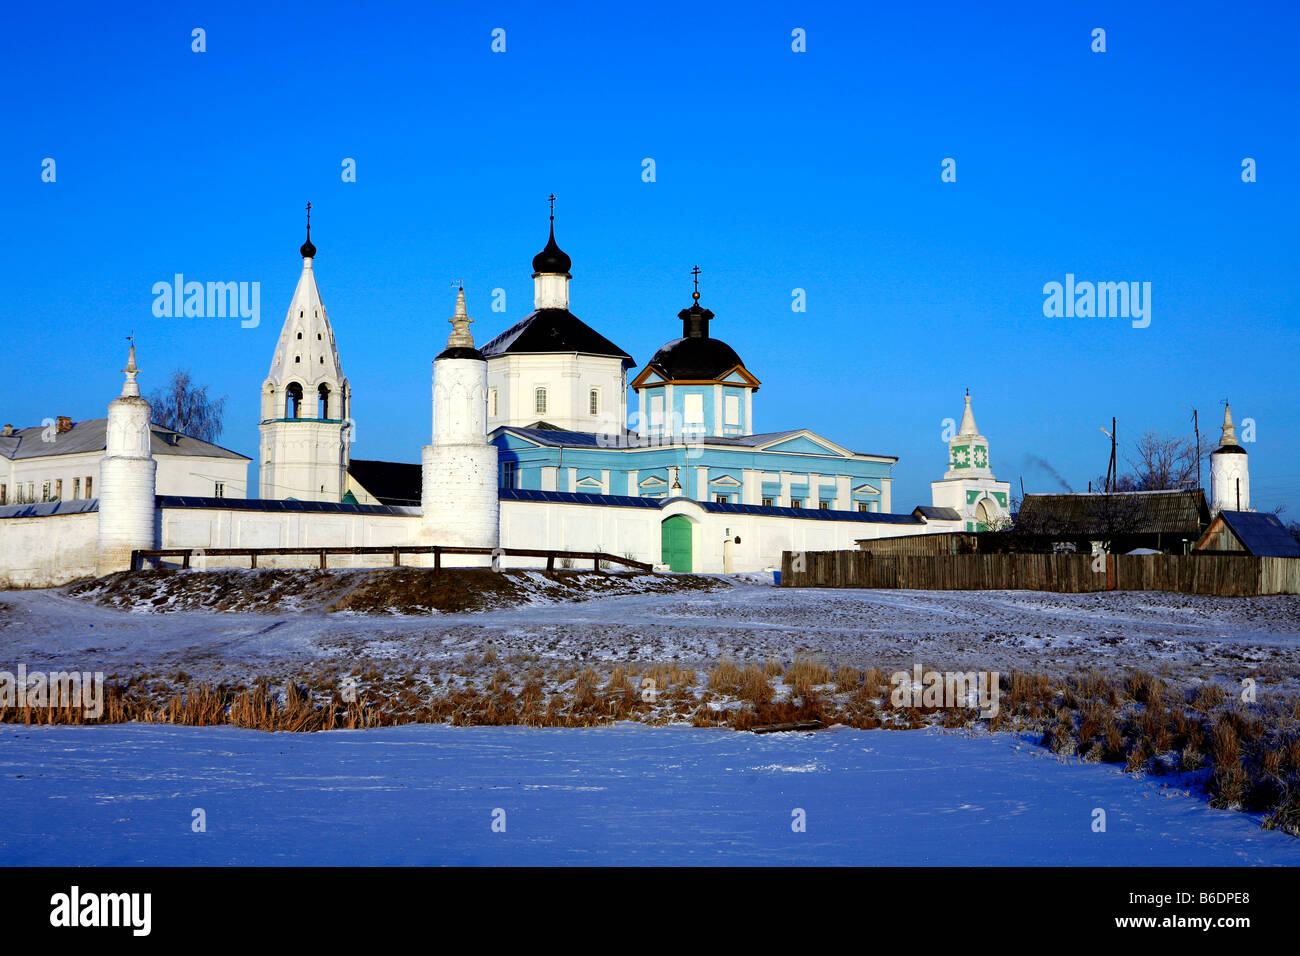 Sights of Kolomna. Monasteries and churches of Kolomna 89